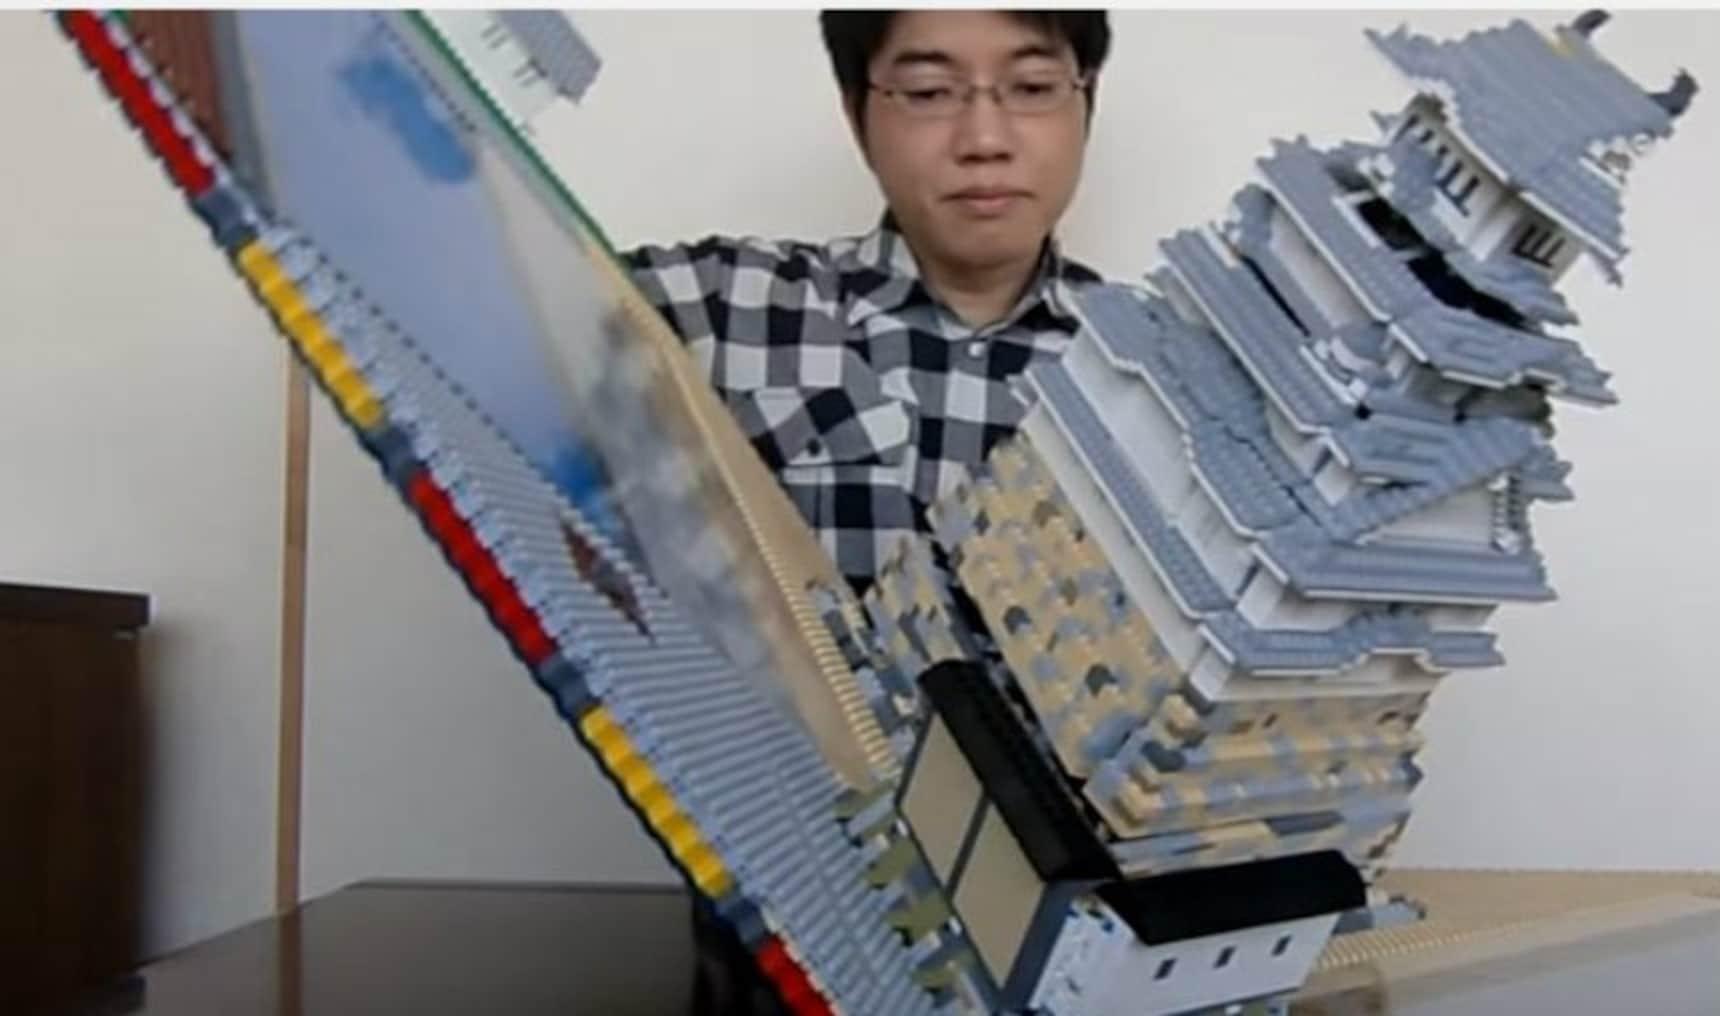 Folding Lego Samurai Not Included